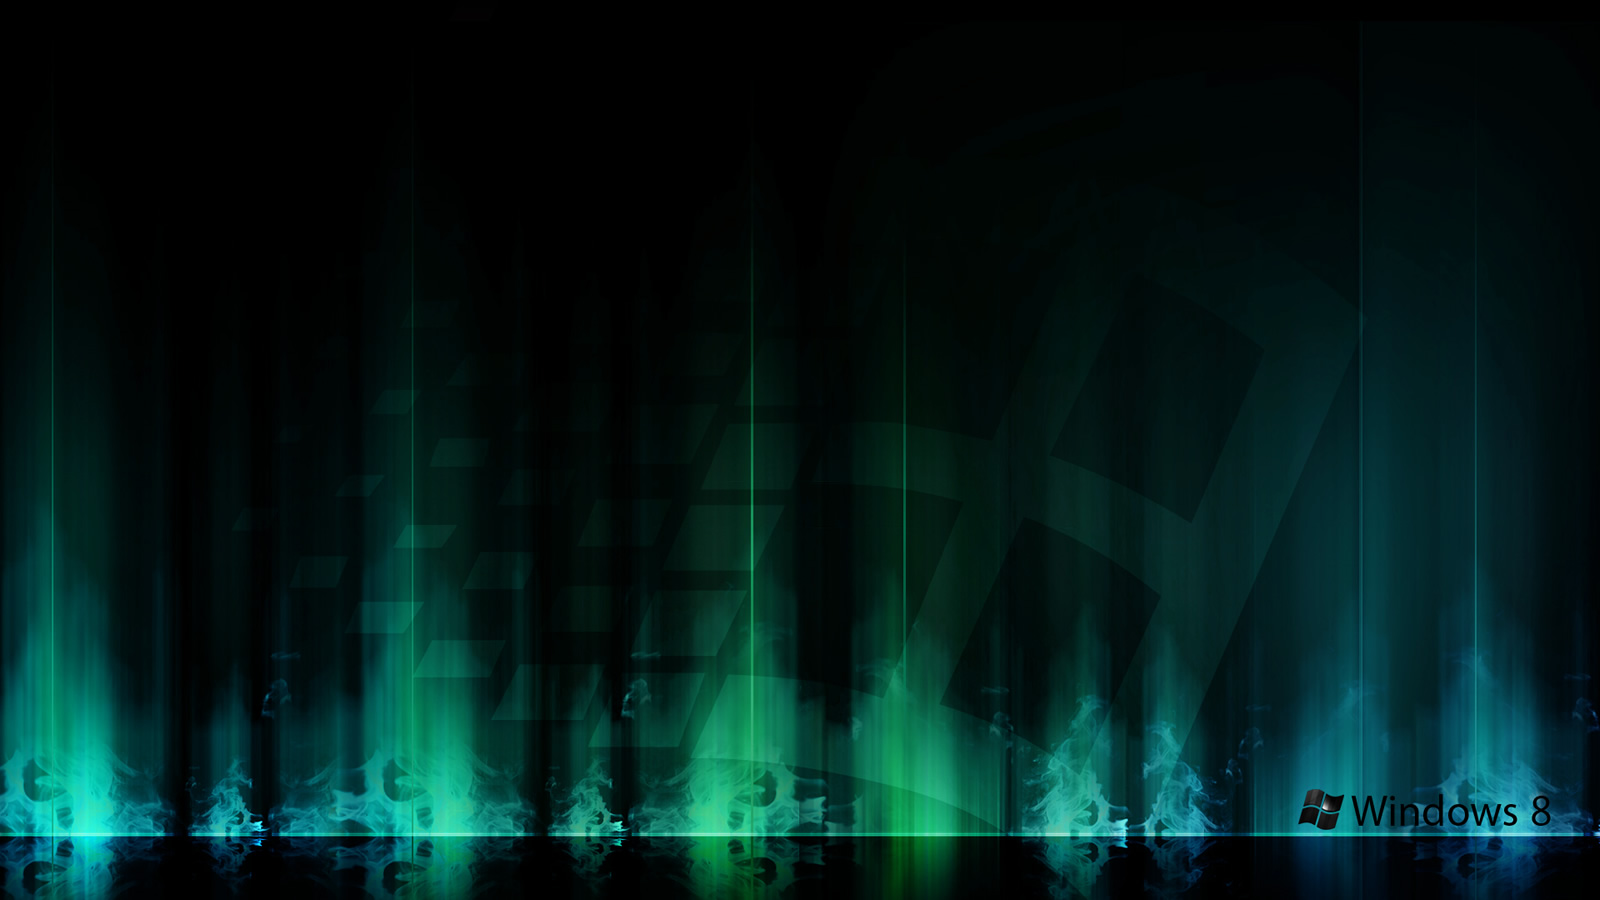 Windows Windows 8 Server 317331 Hd Wallpaper Backgrounds Download